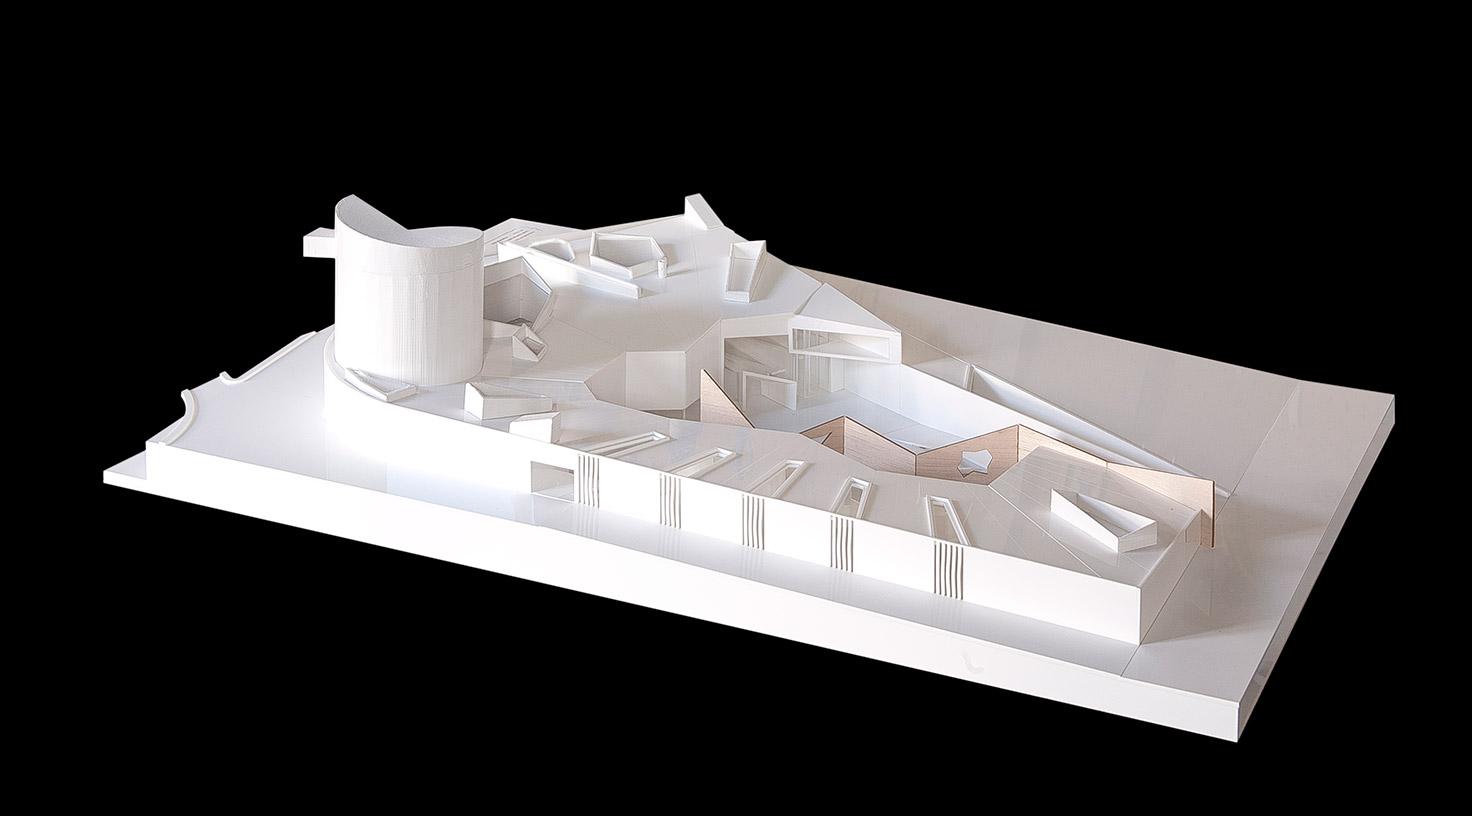 maqueta-arquitectura-valencia-museo-memorial-guerra-civil-arquiayuda (1)